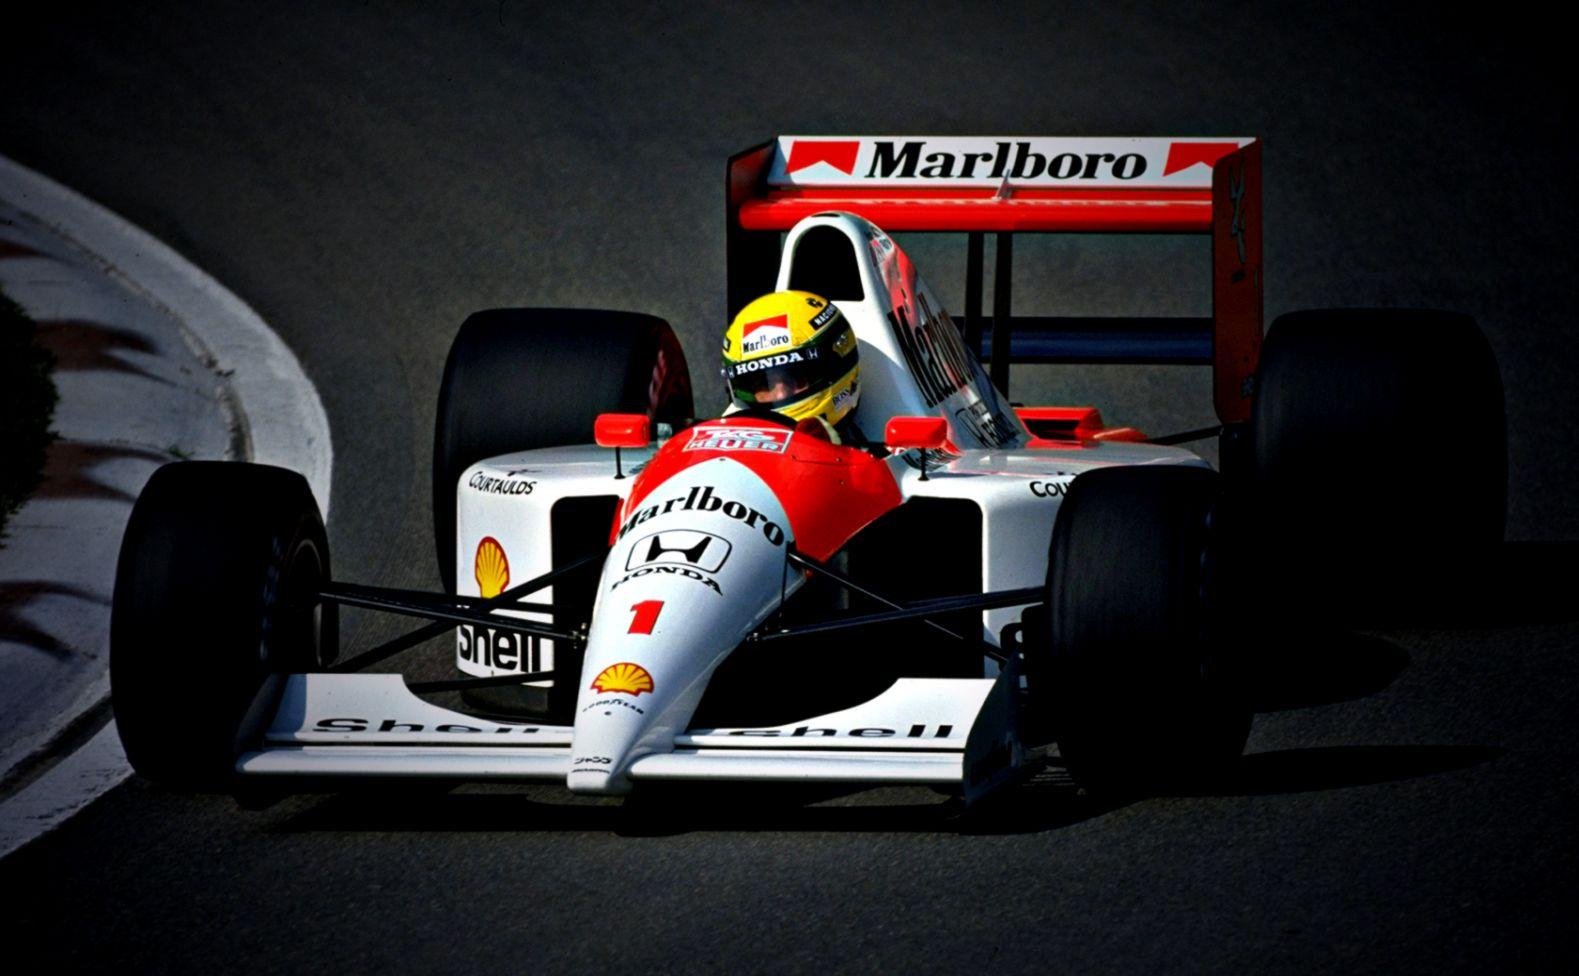 Sport Wallpaper Photos Cars F1 Ayrton Senna Wallpapers Sinaga